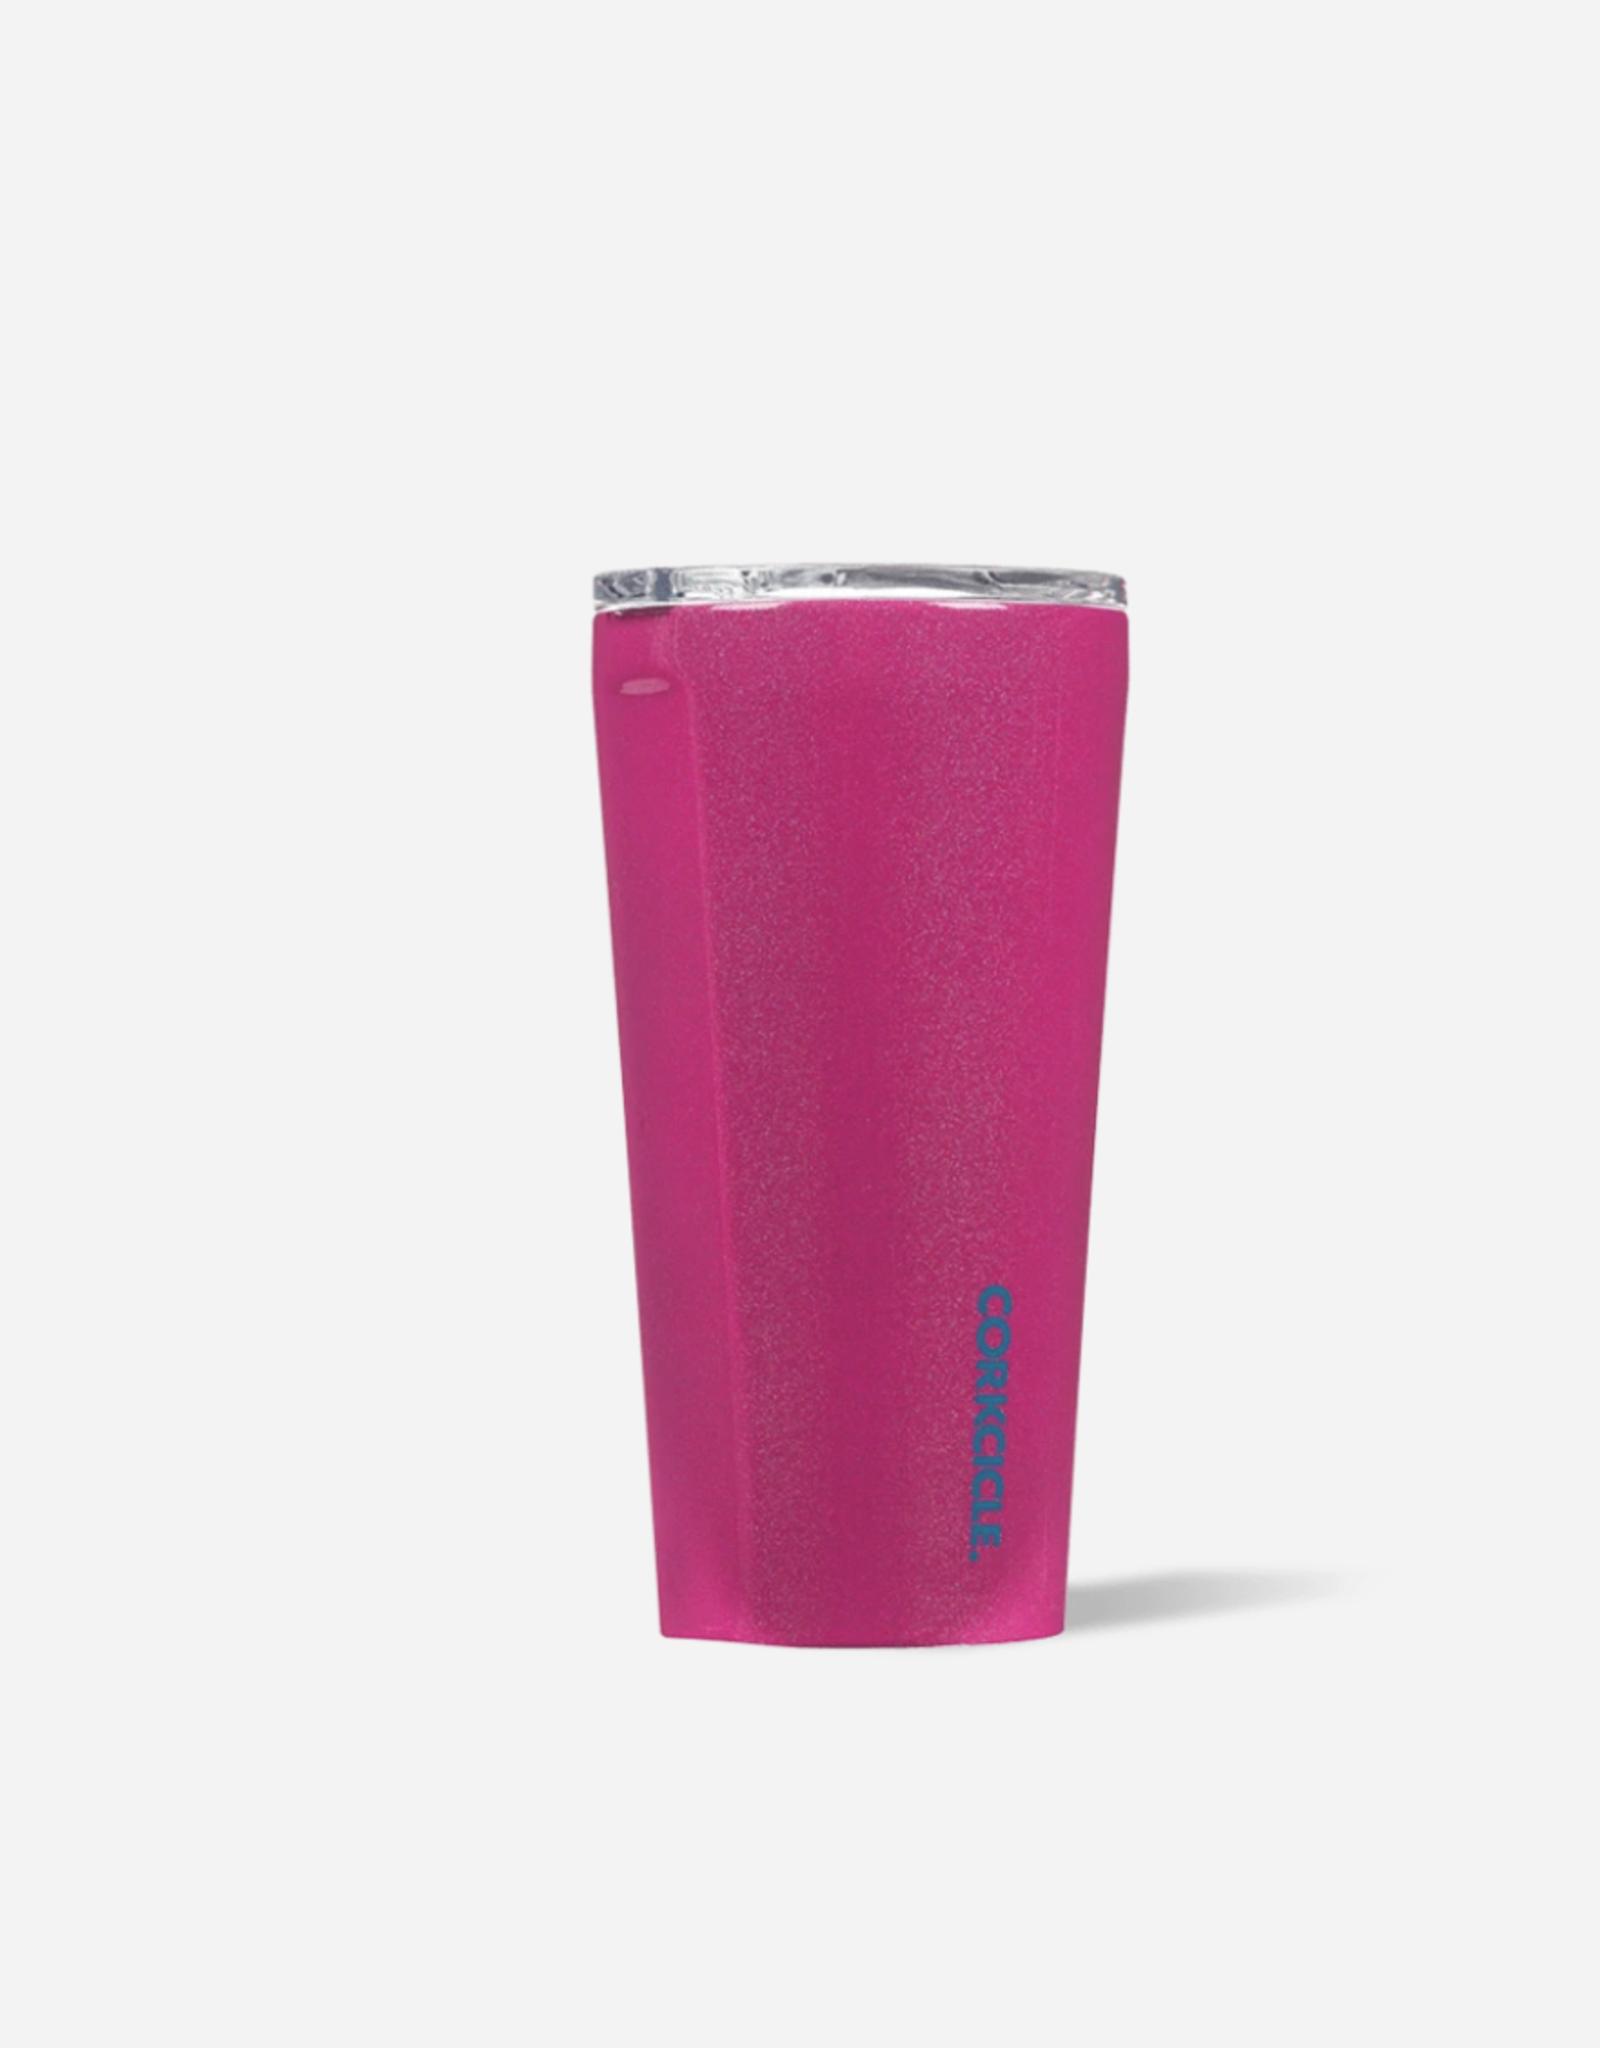 Corkcicle Pink Dazzle Tumbler 16 OZ